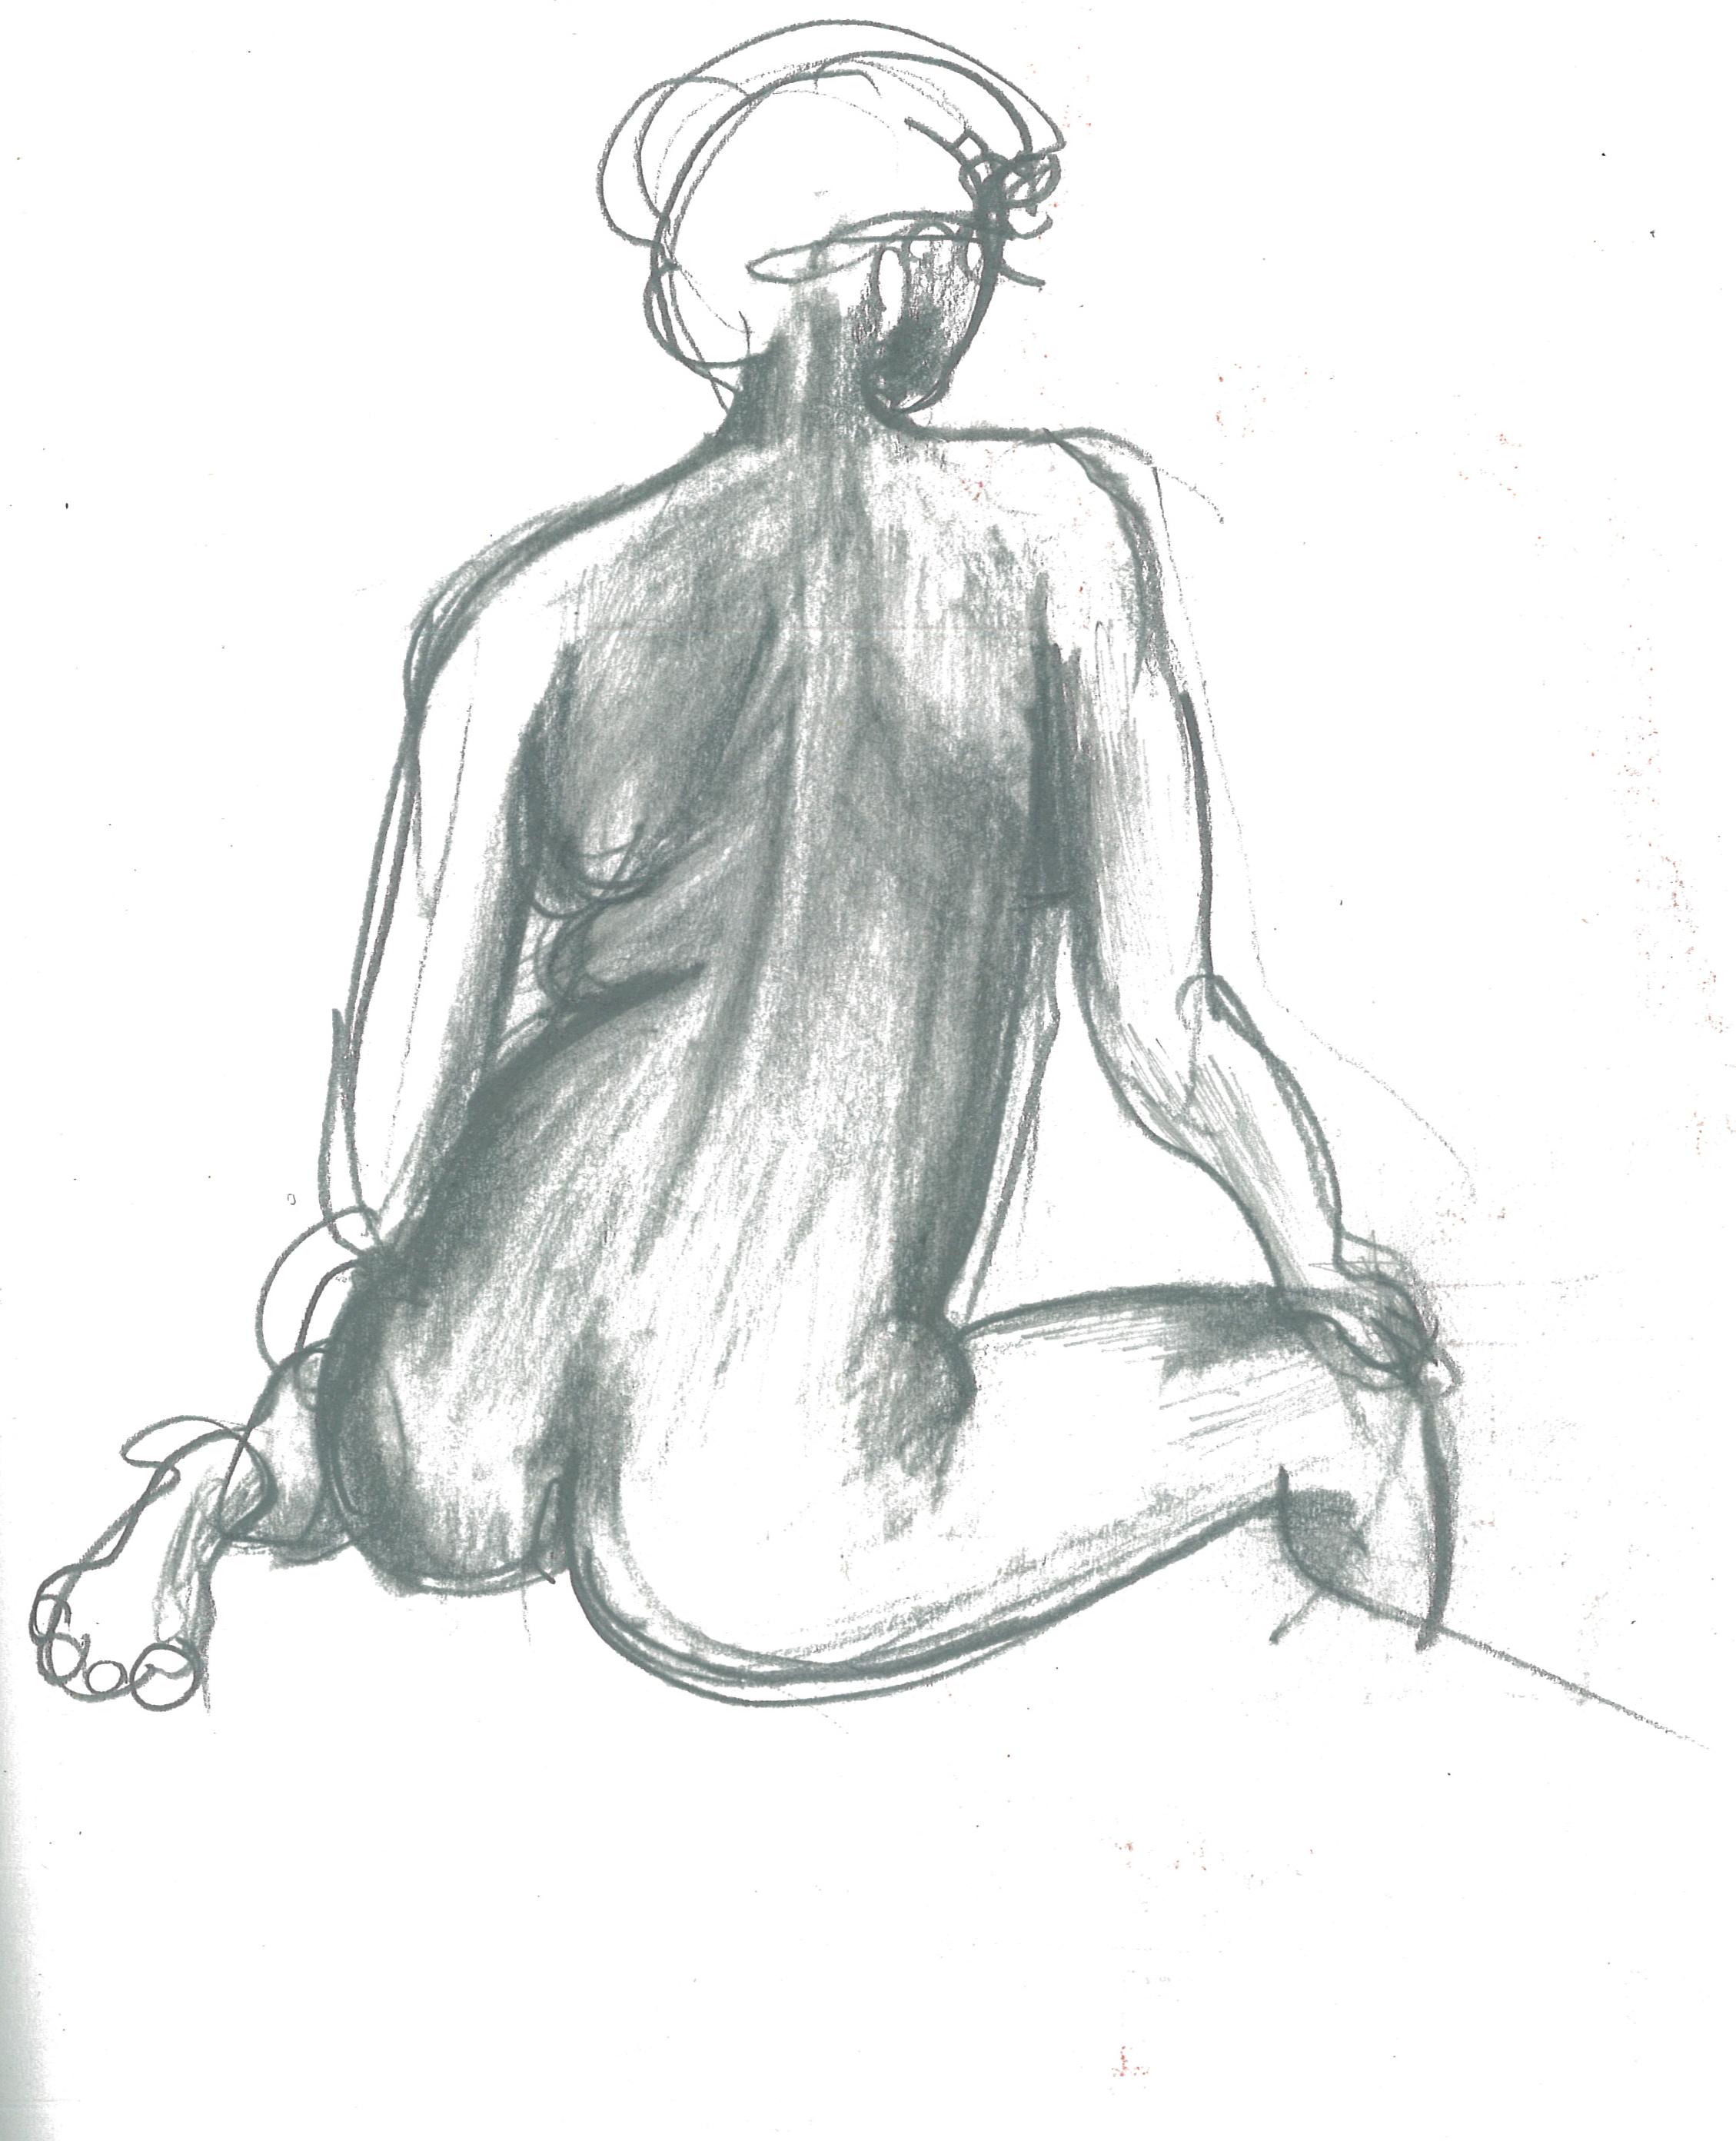 FIGURE_2_SketchbookA_ScanD_Page_7.jpg